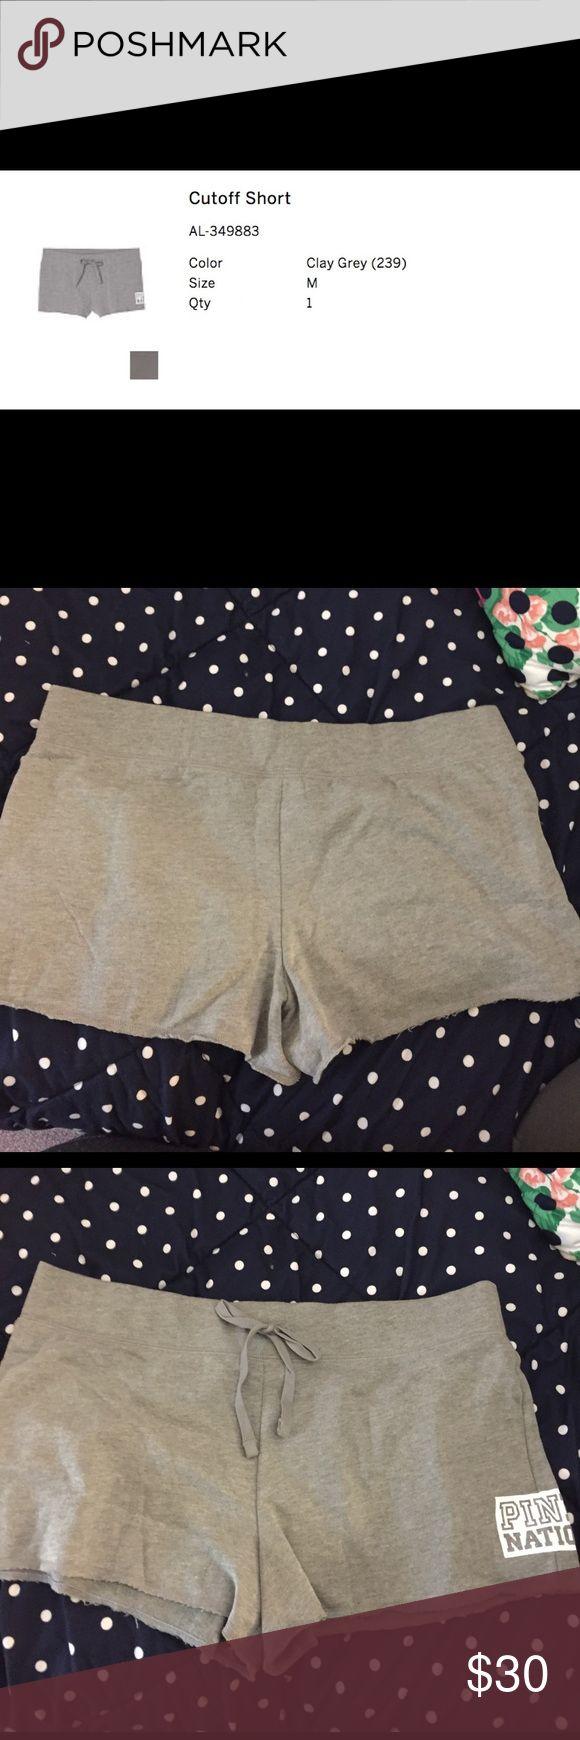 VS PINK cut off shorts VS PINK CUT OFF SHIRTS BRAND NEW! Shorts